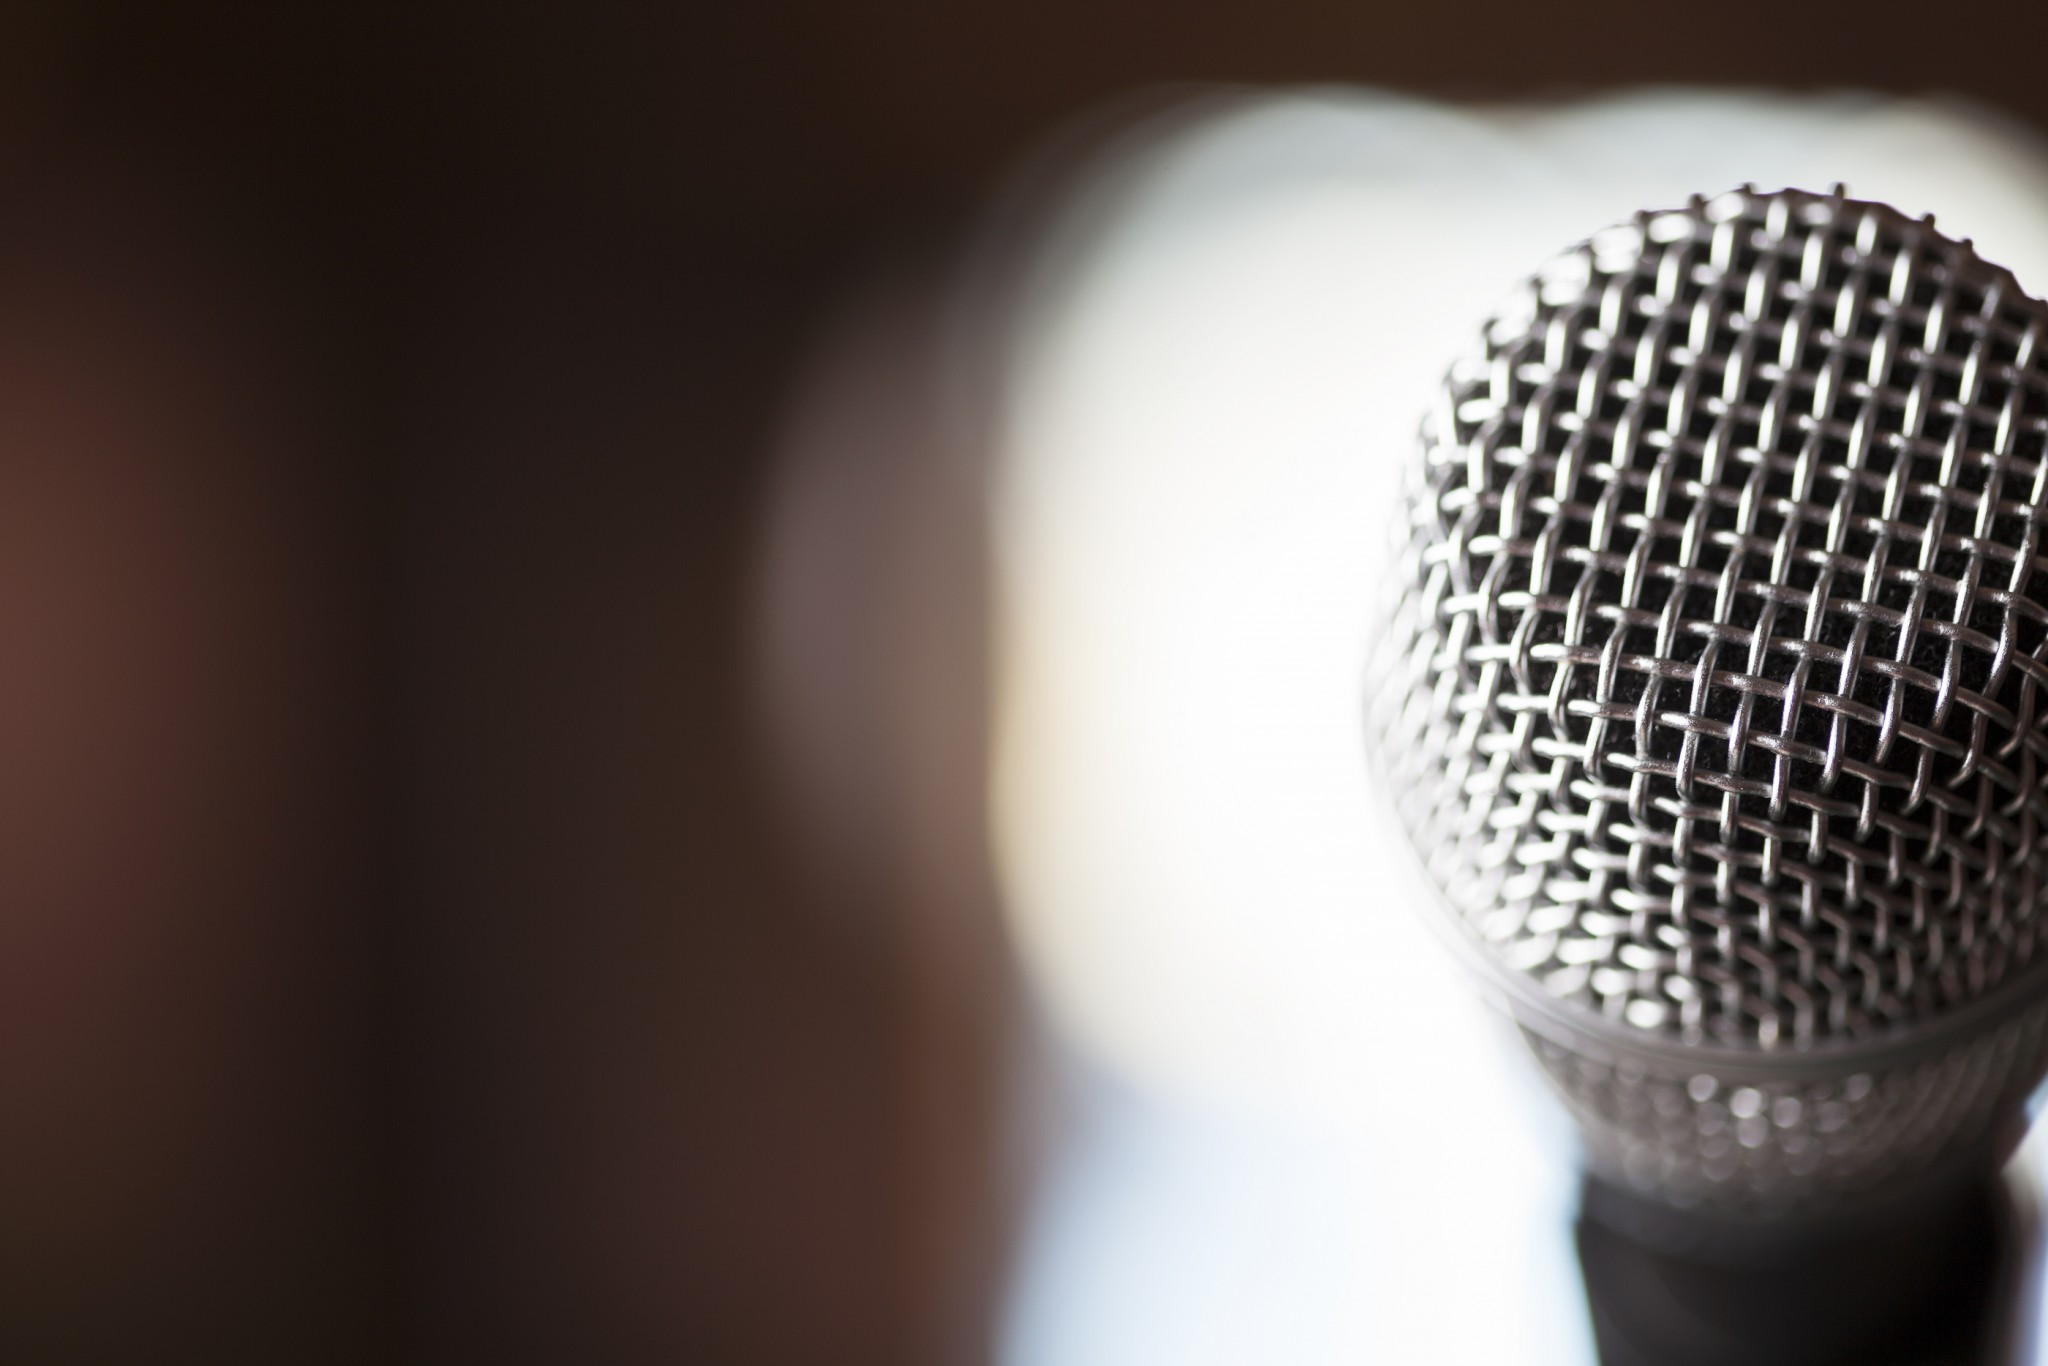 bigstock-Close-Up-Microphone-Background-41286925